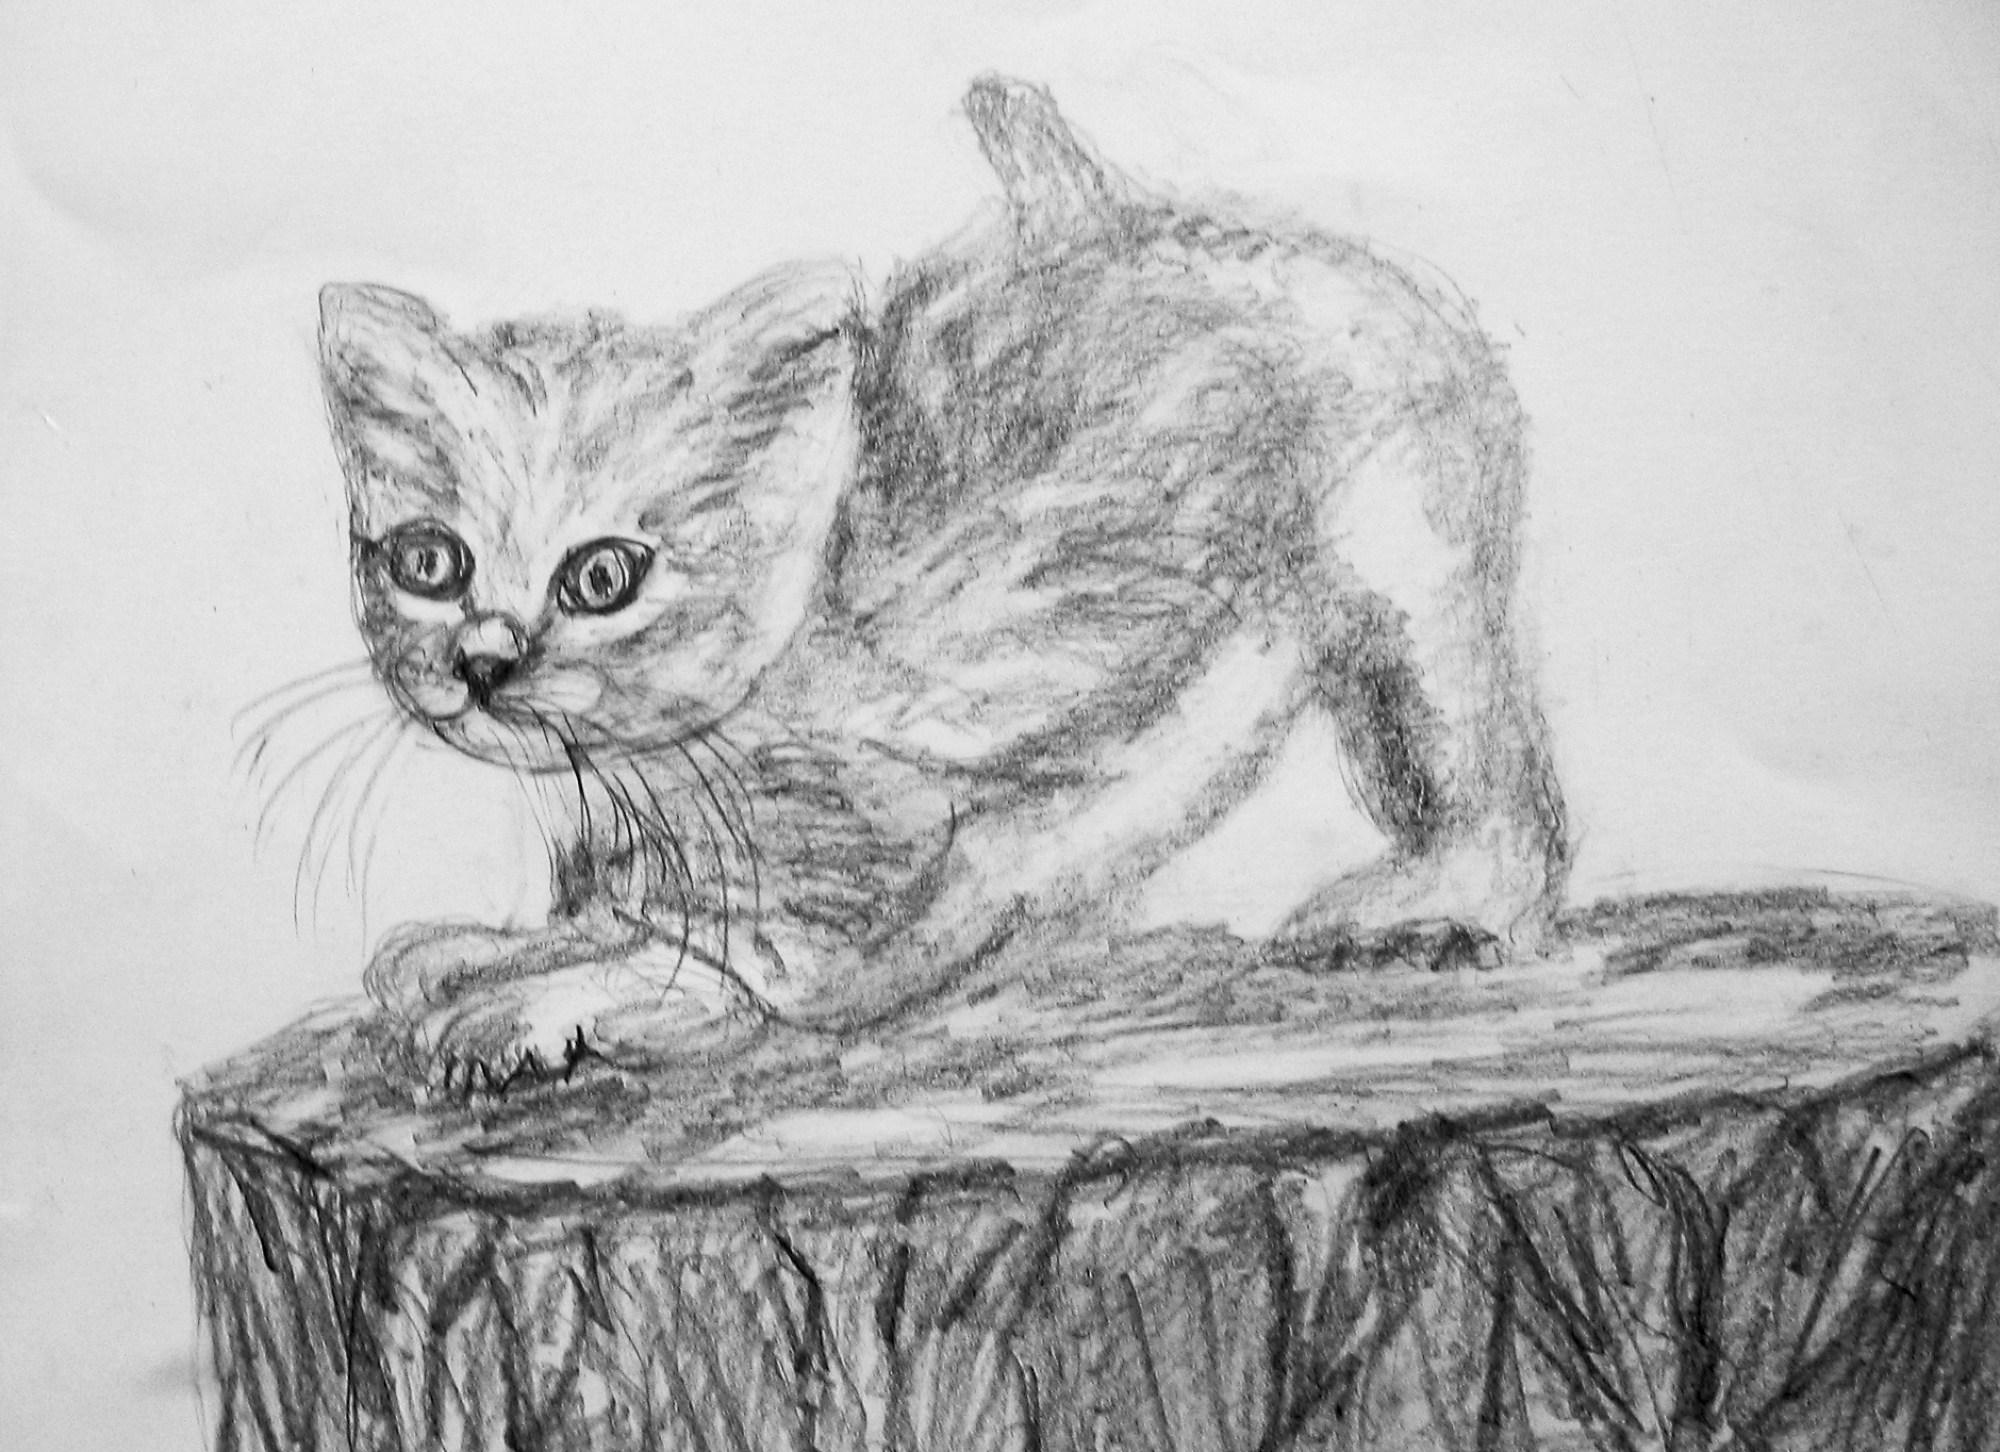 2009 - Junge Katze II, 50x40cm, Bleistift